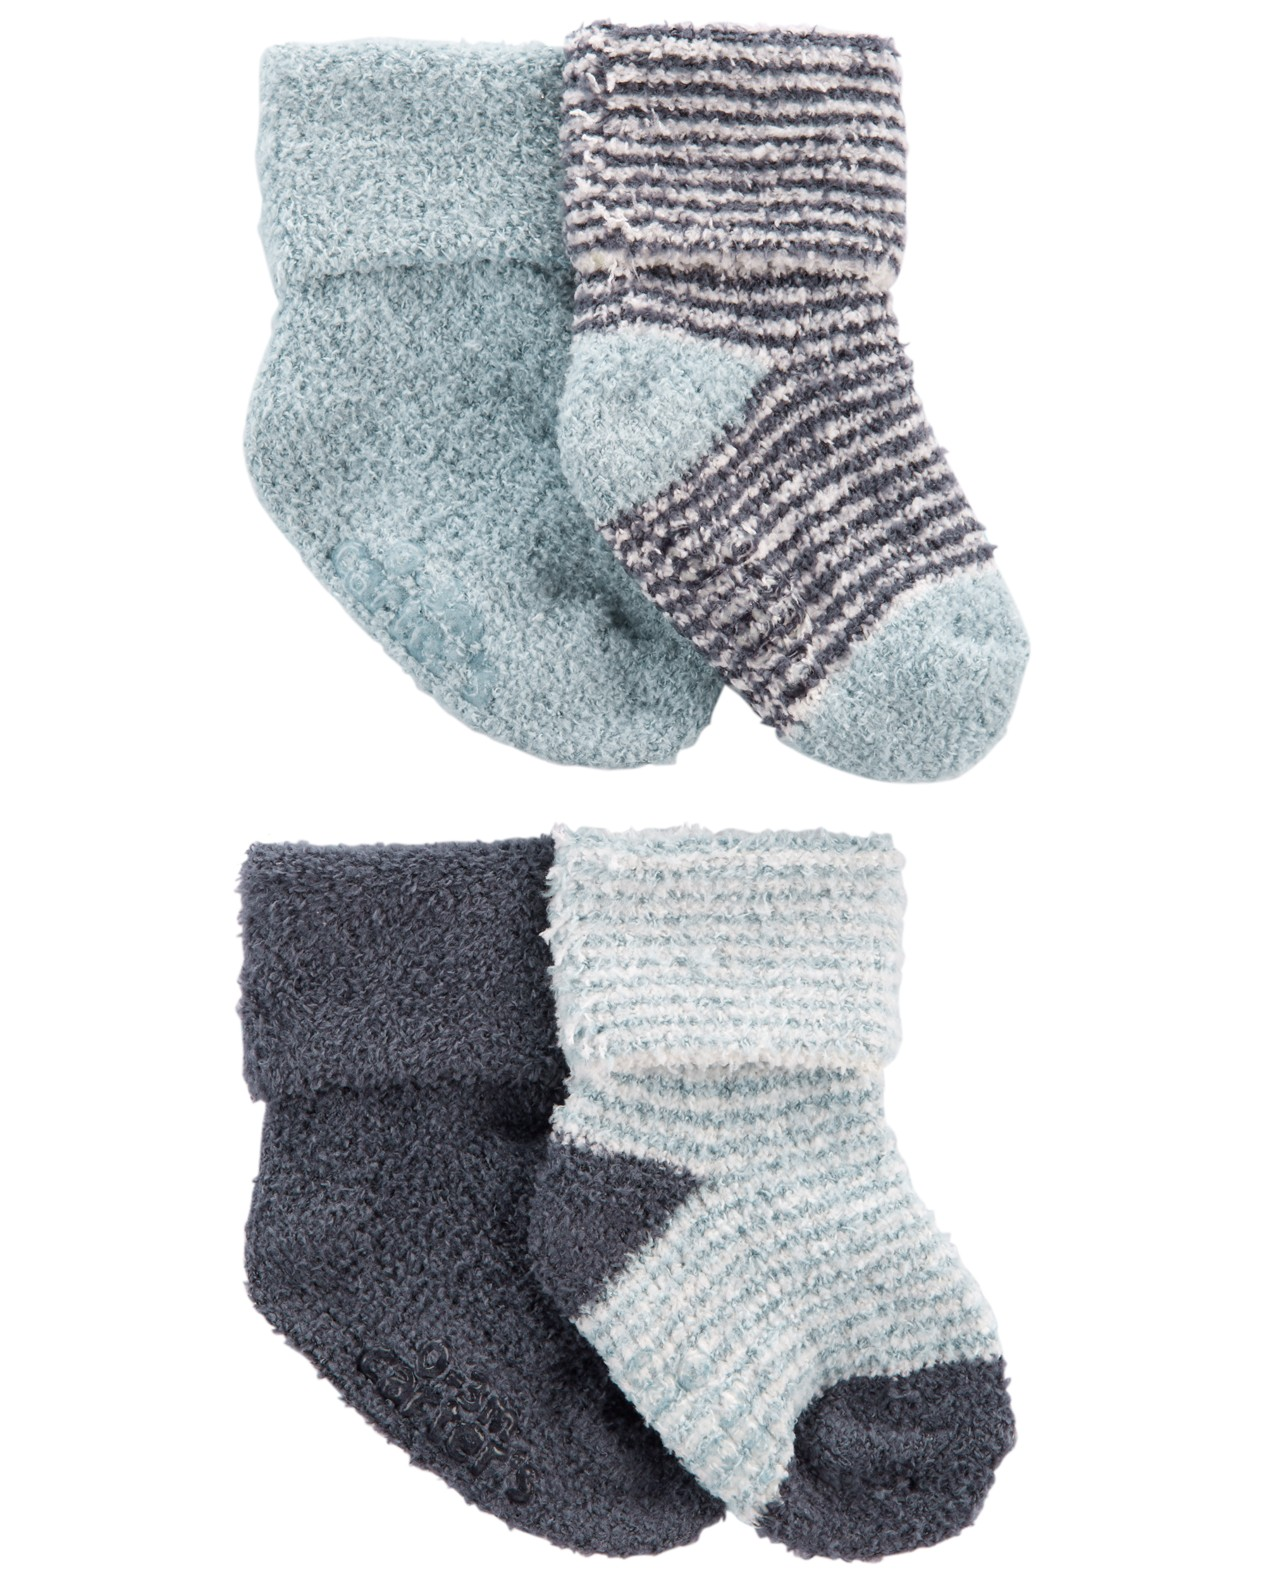 CARTER'S Ponožky Stripes Blue chlapec LBB 4ks NB